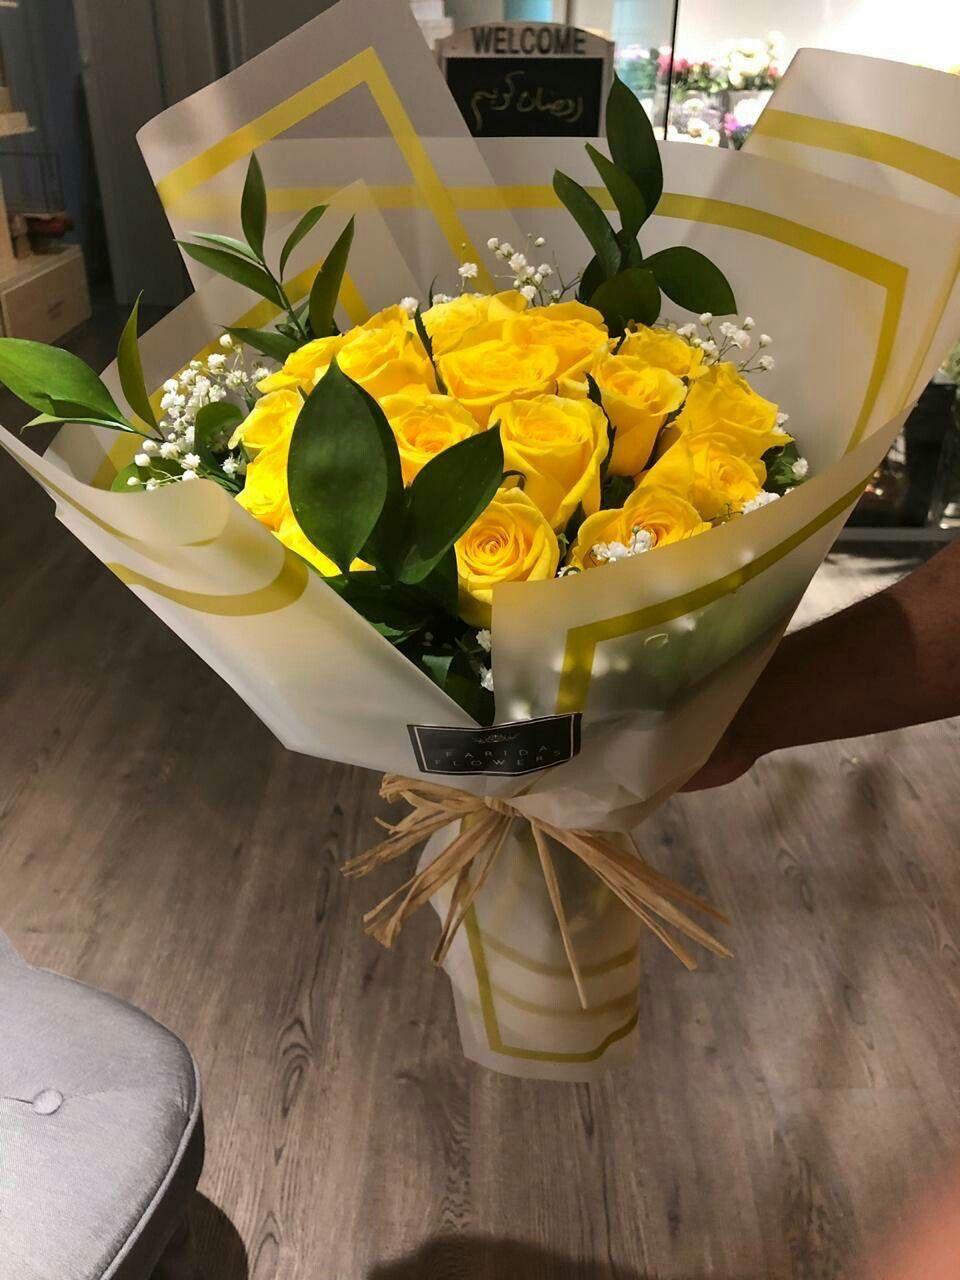 تشبهين الورد الاصفر وإن ضحكتي حاول انه يشبهك لـ عيونك ي شيخه Table Decorations Decor Home Decor